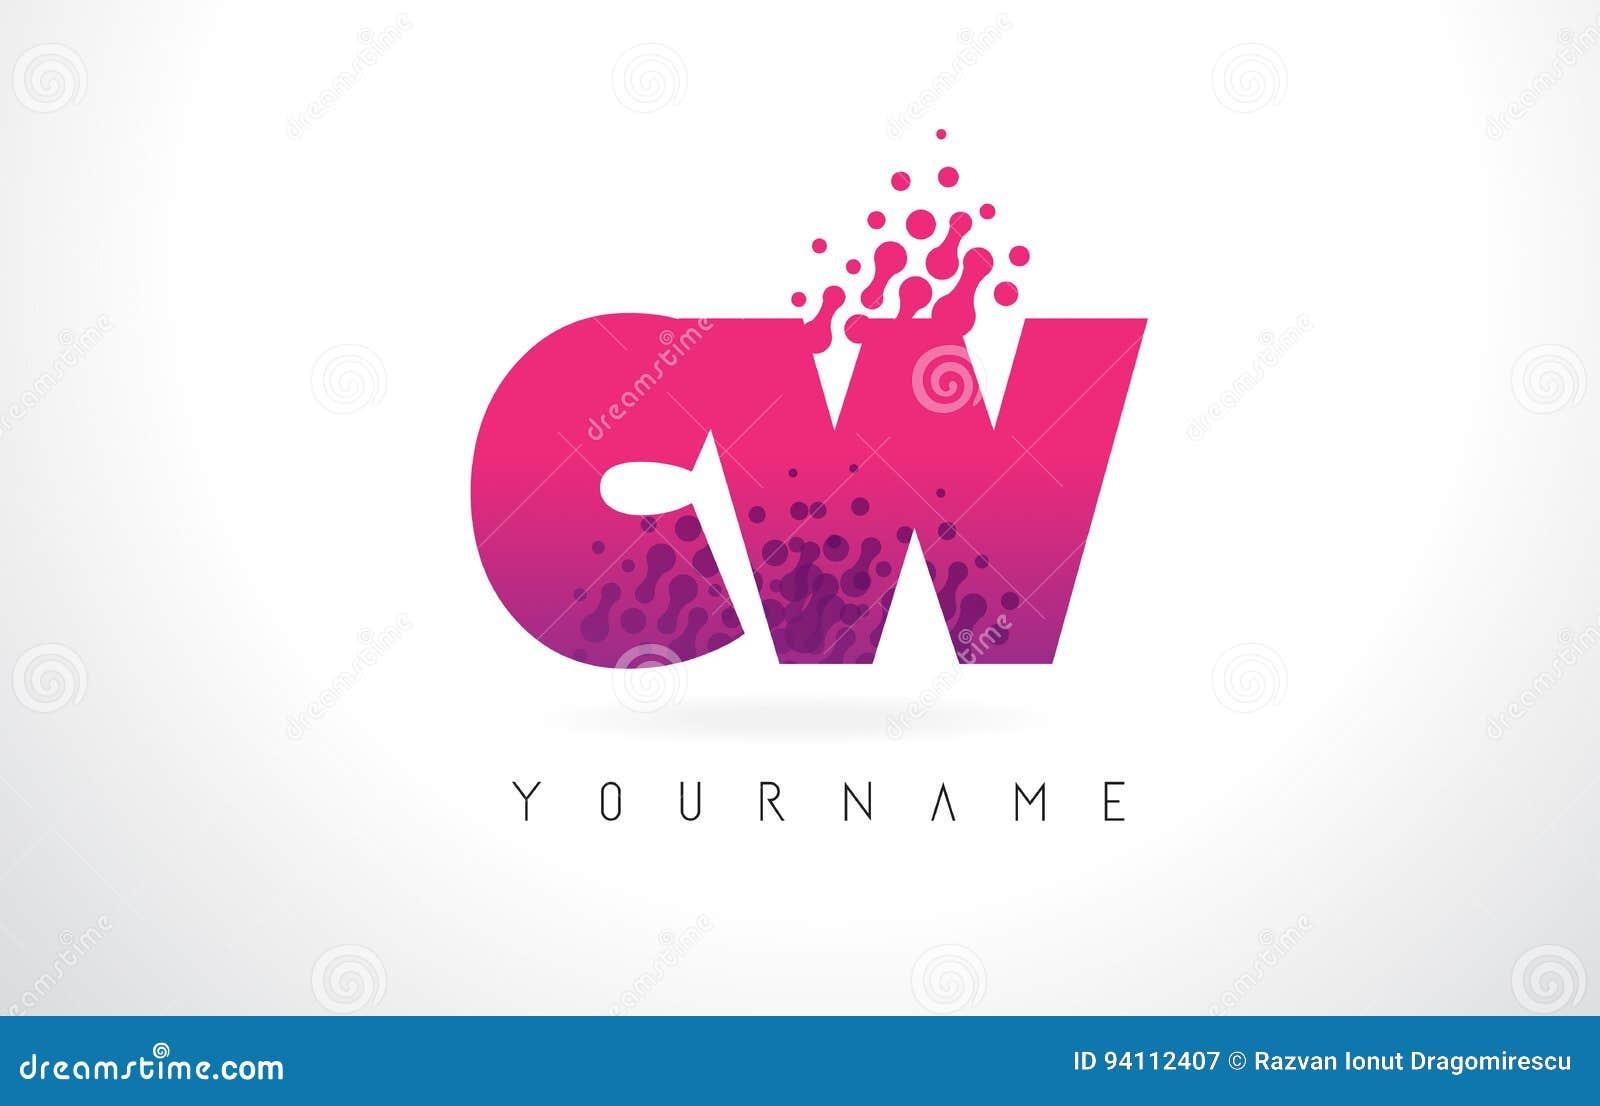 CW C W Letter Logo With Pink Purple Color And Particles Dots Des ...